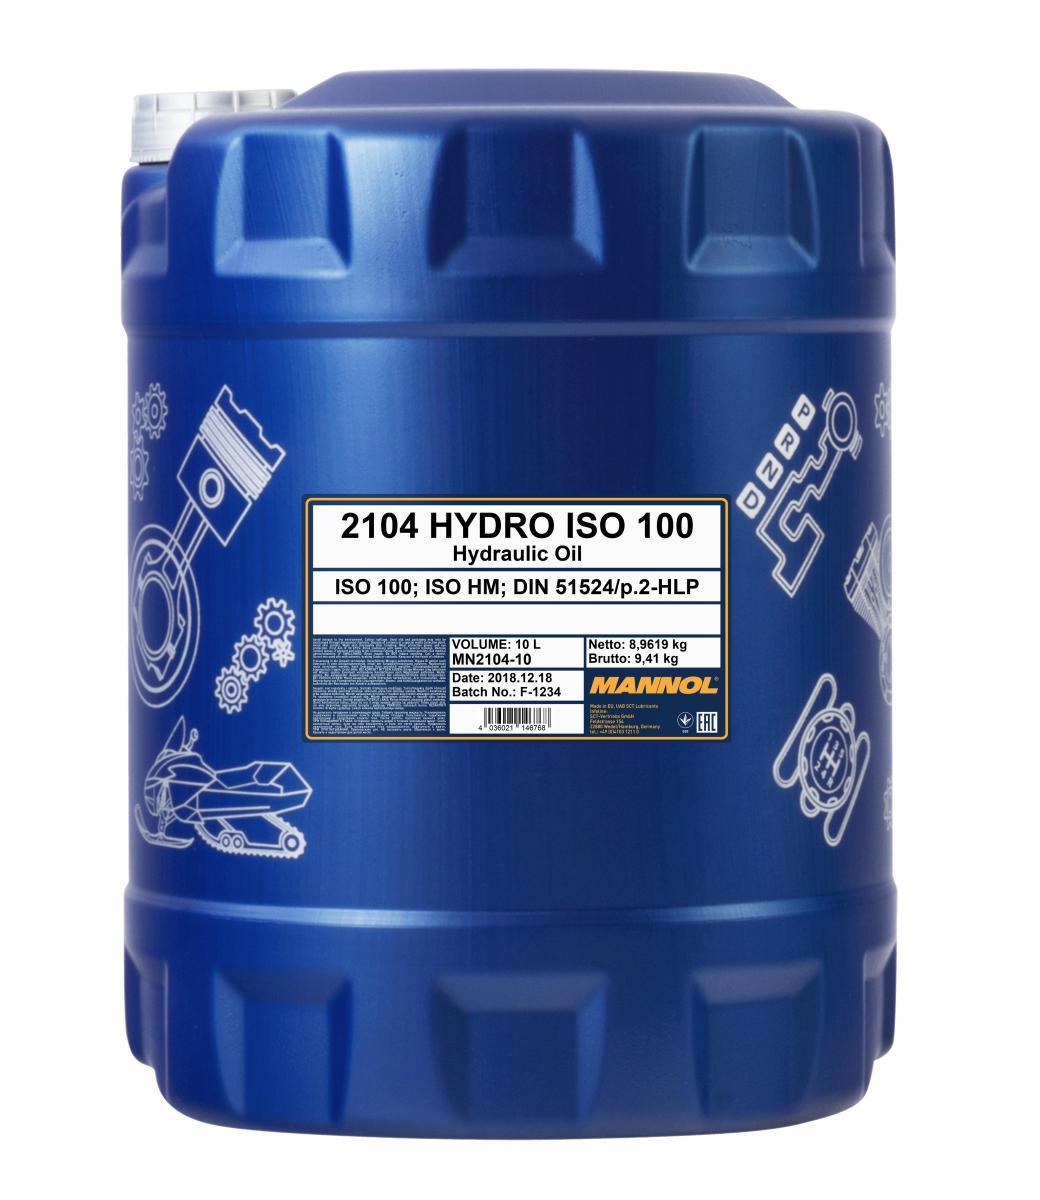 Hydro ISO 100